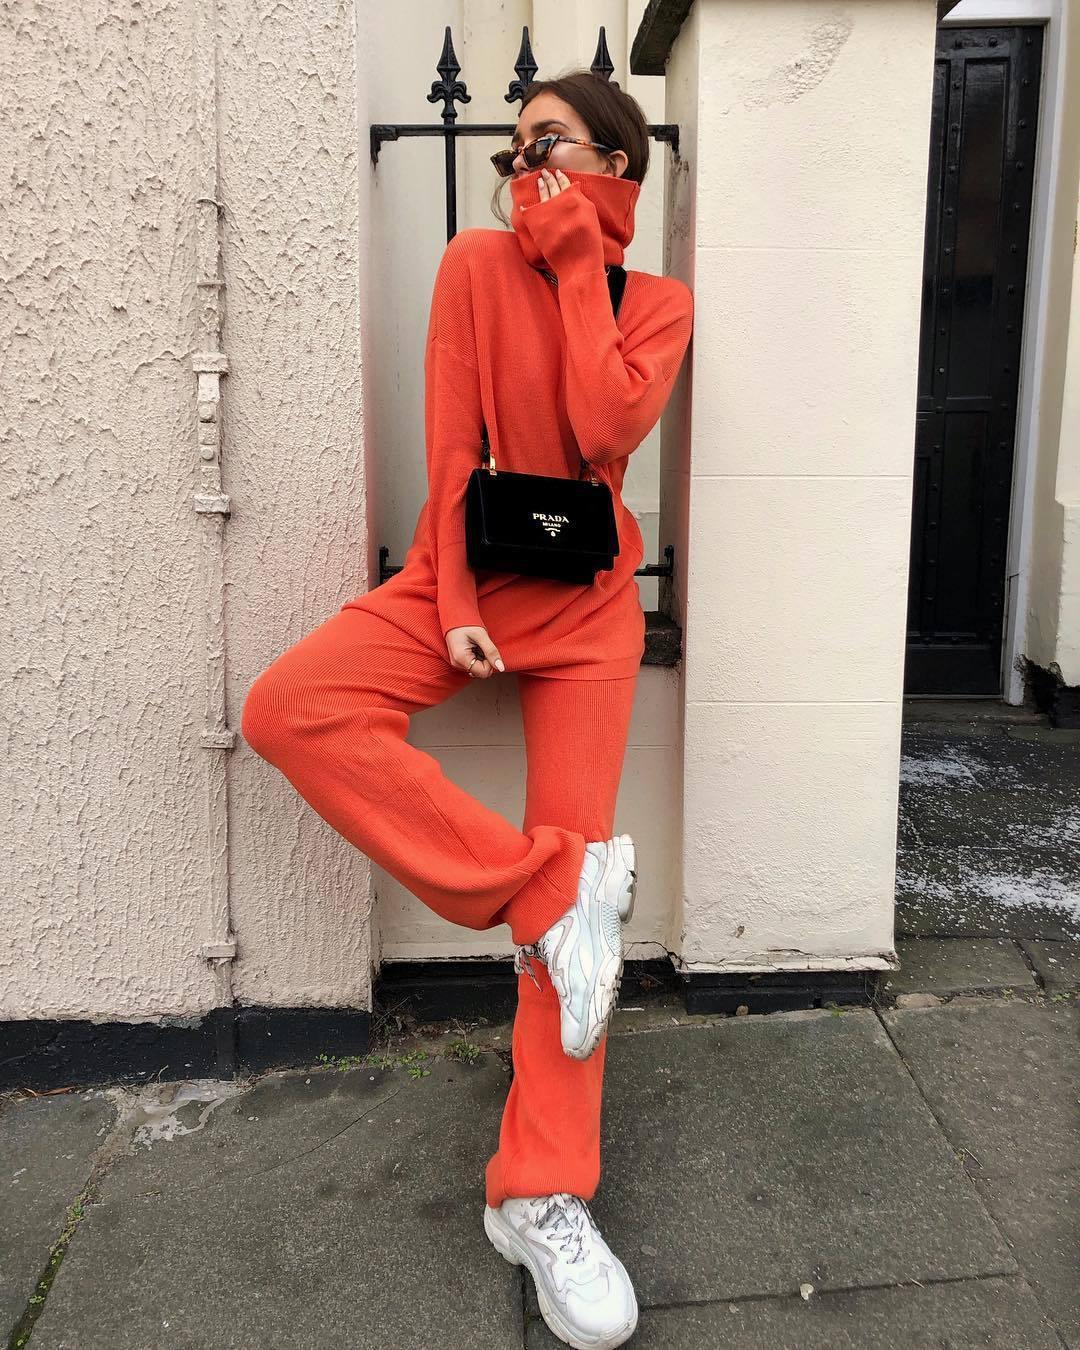 sweater turtleneck sweater neon wide-leg pants white sneakers black bag prada bag sunglasses